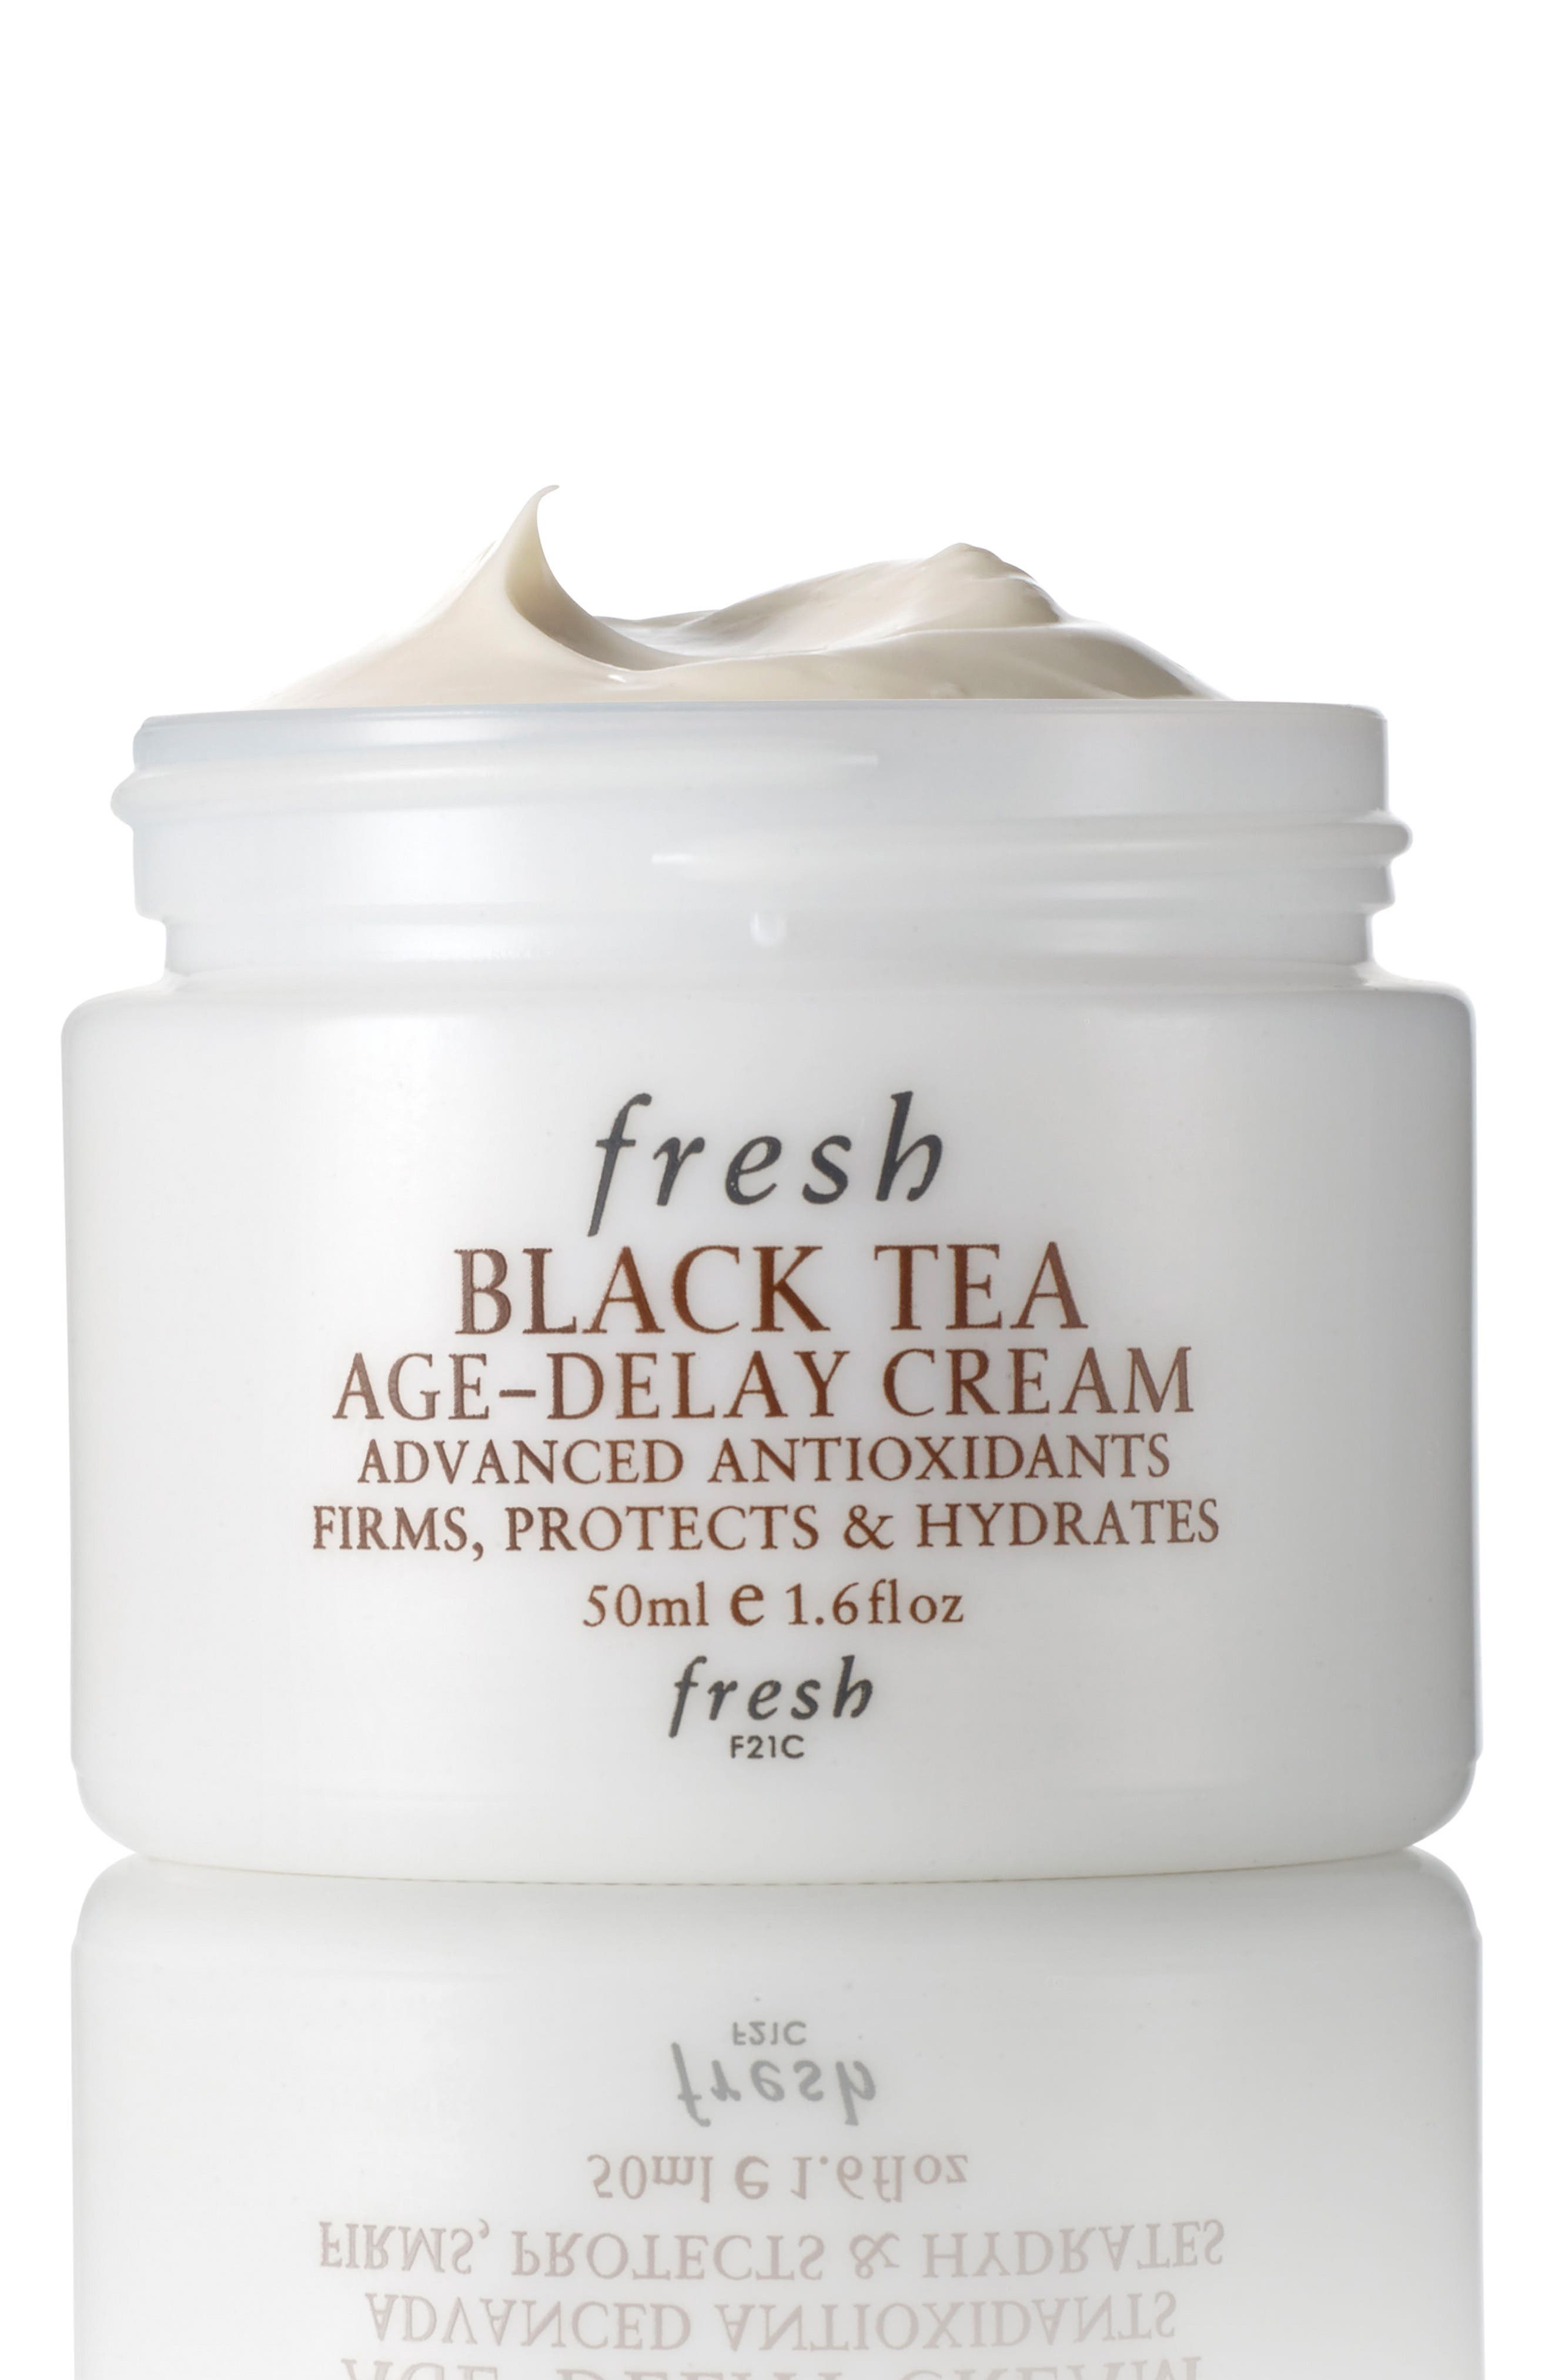 Black Tea Age-Delay Cream,                             Main thumbnail 1, color,                             NO COLOR